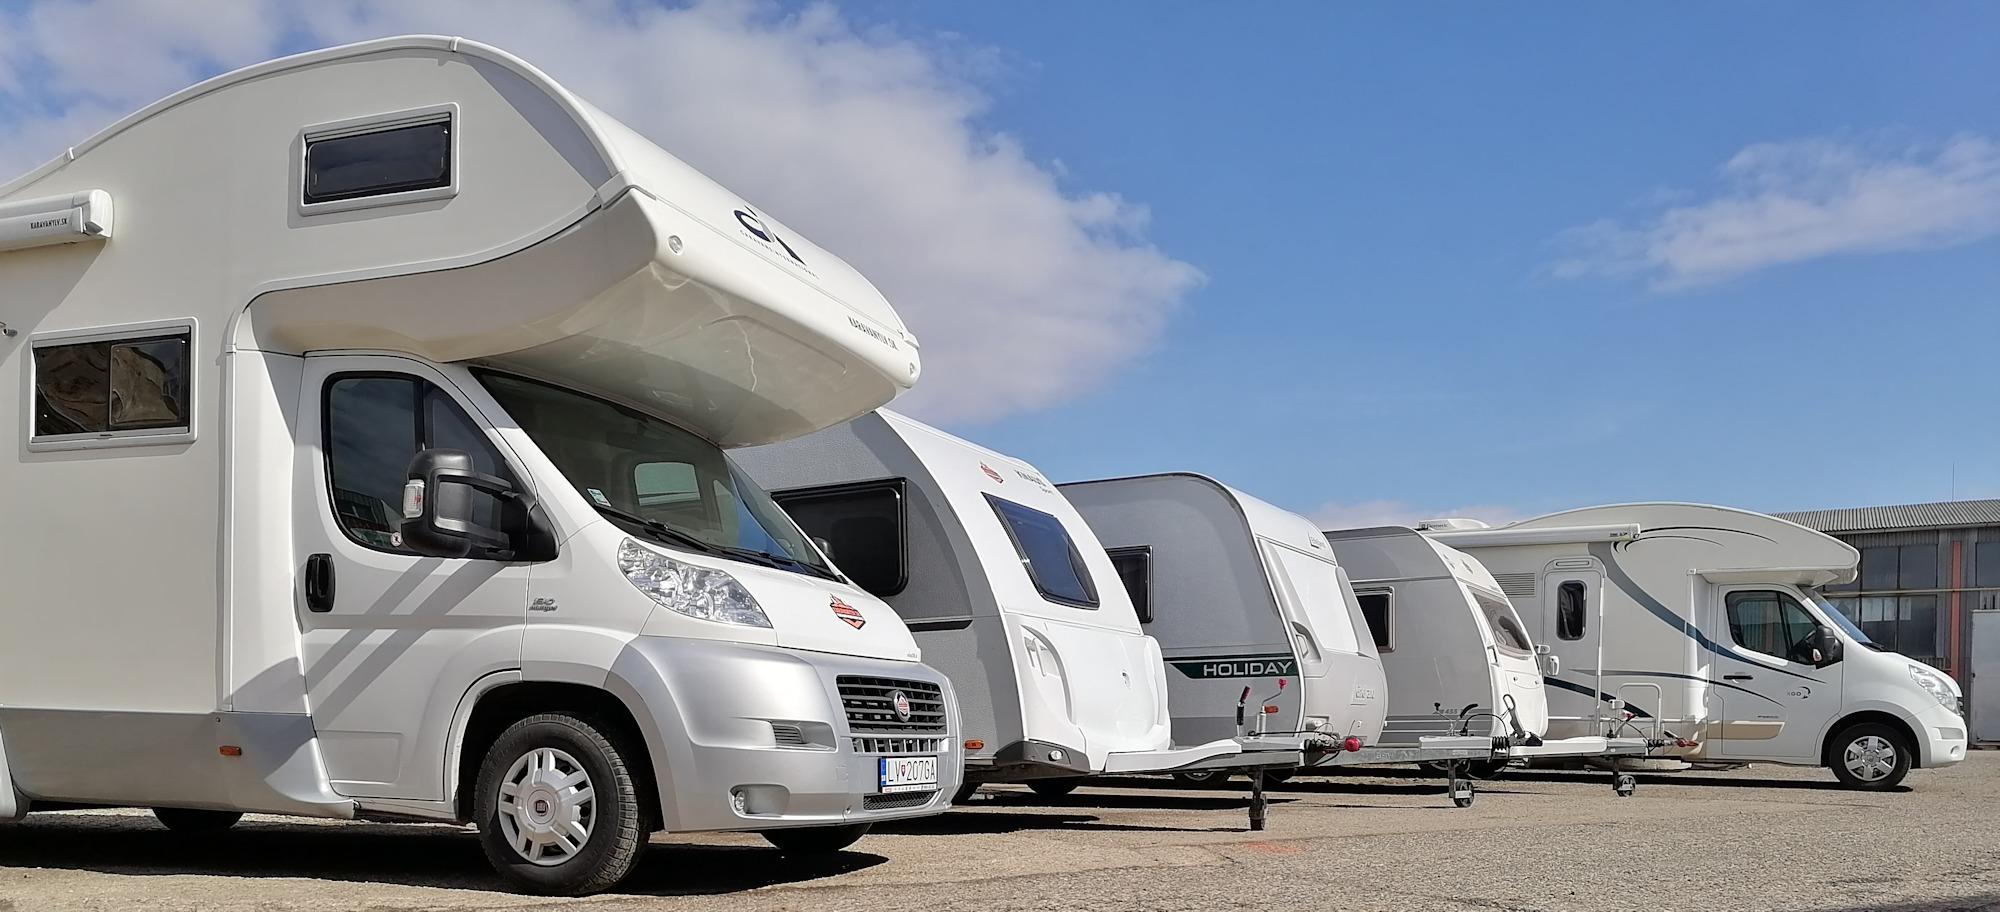 karavany-uvod1